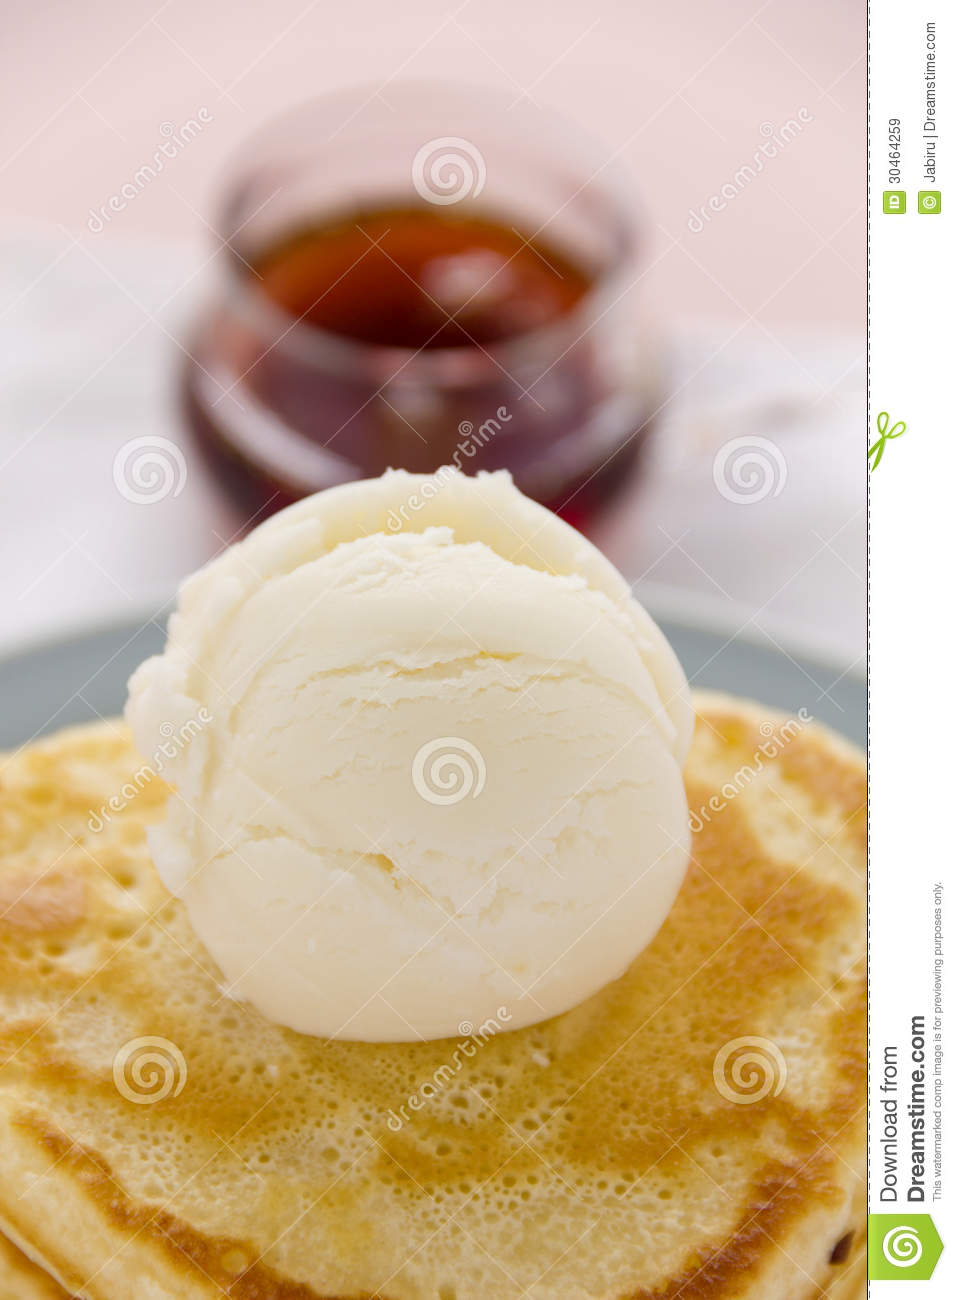 Vanilla Ice Cream with Maple Syrup